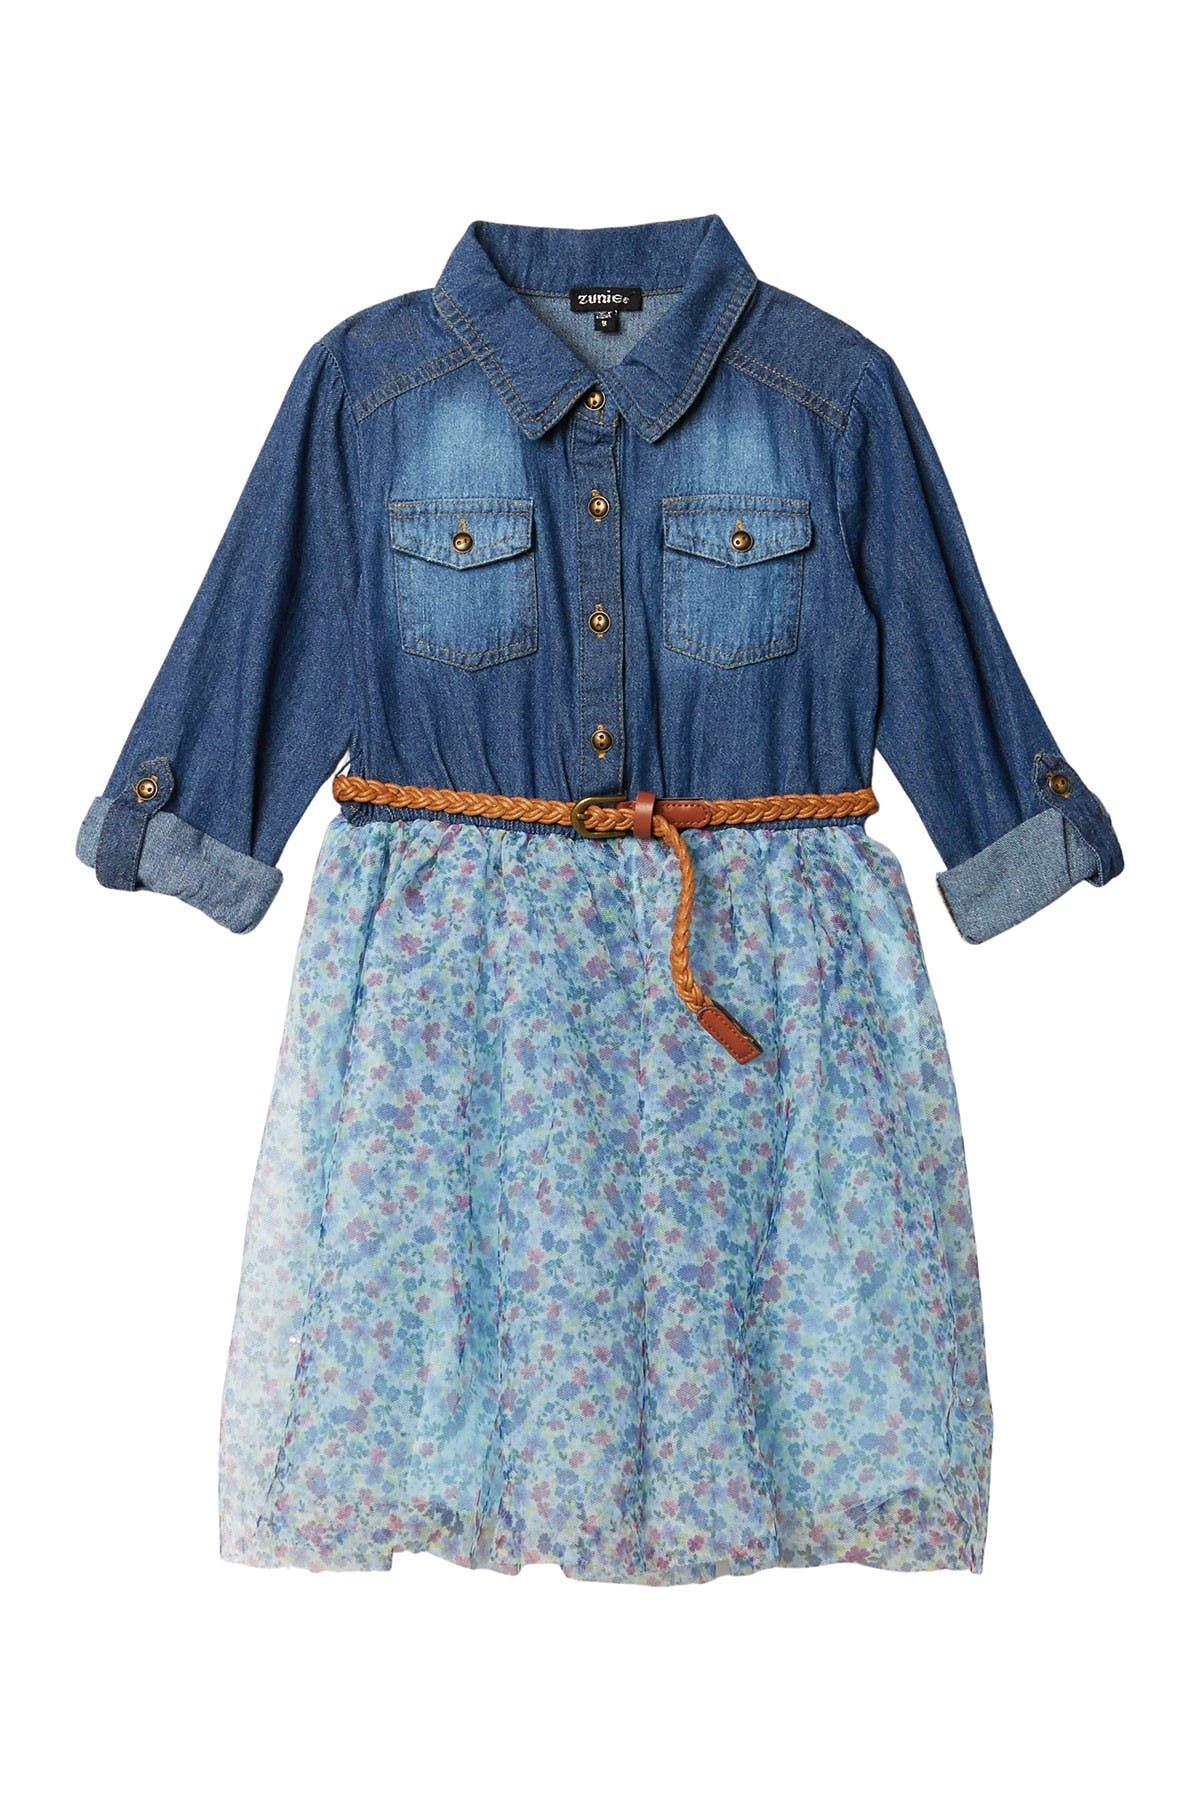 Zunie Denim & Ditsy Floral Dress